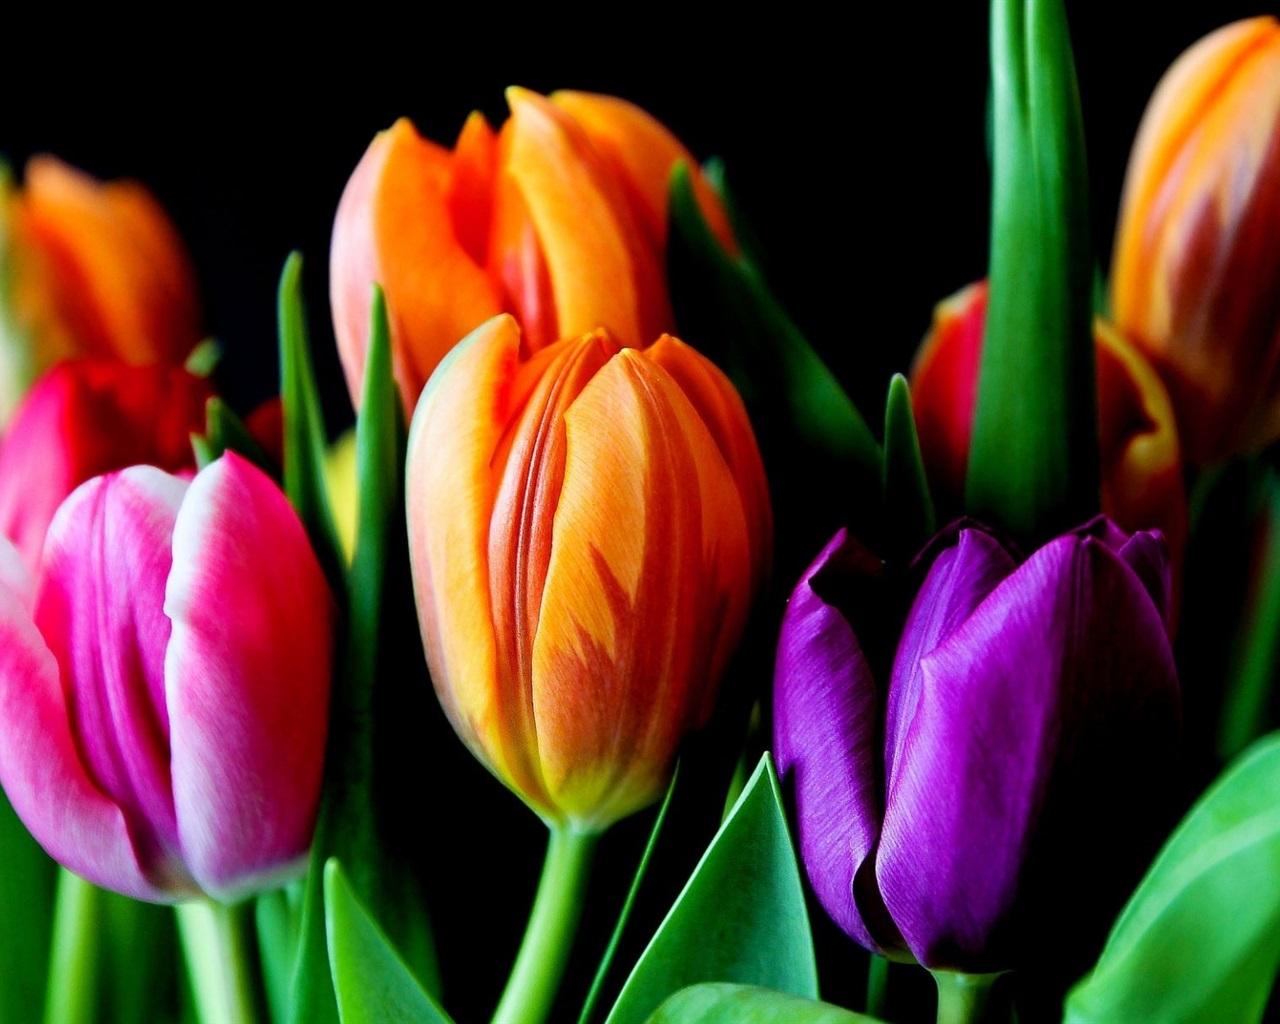 Wallpaper Colorful Tulips Pink Orange Purple Flowers Black